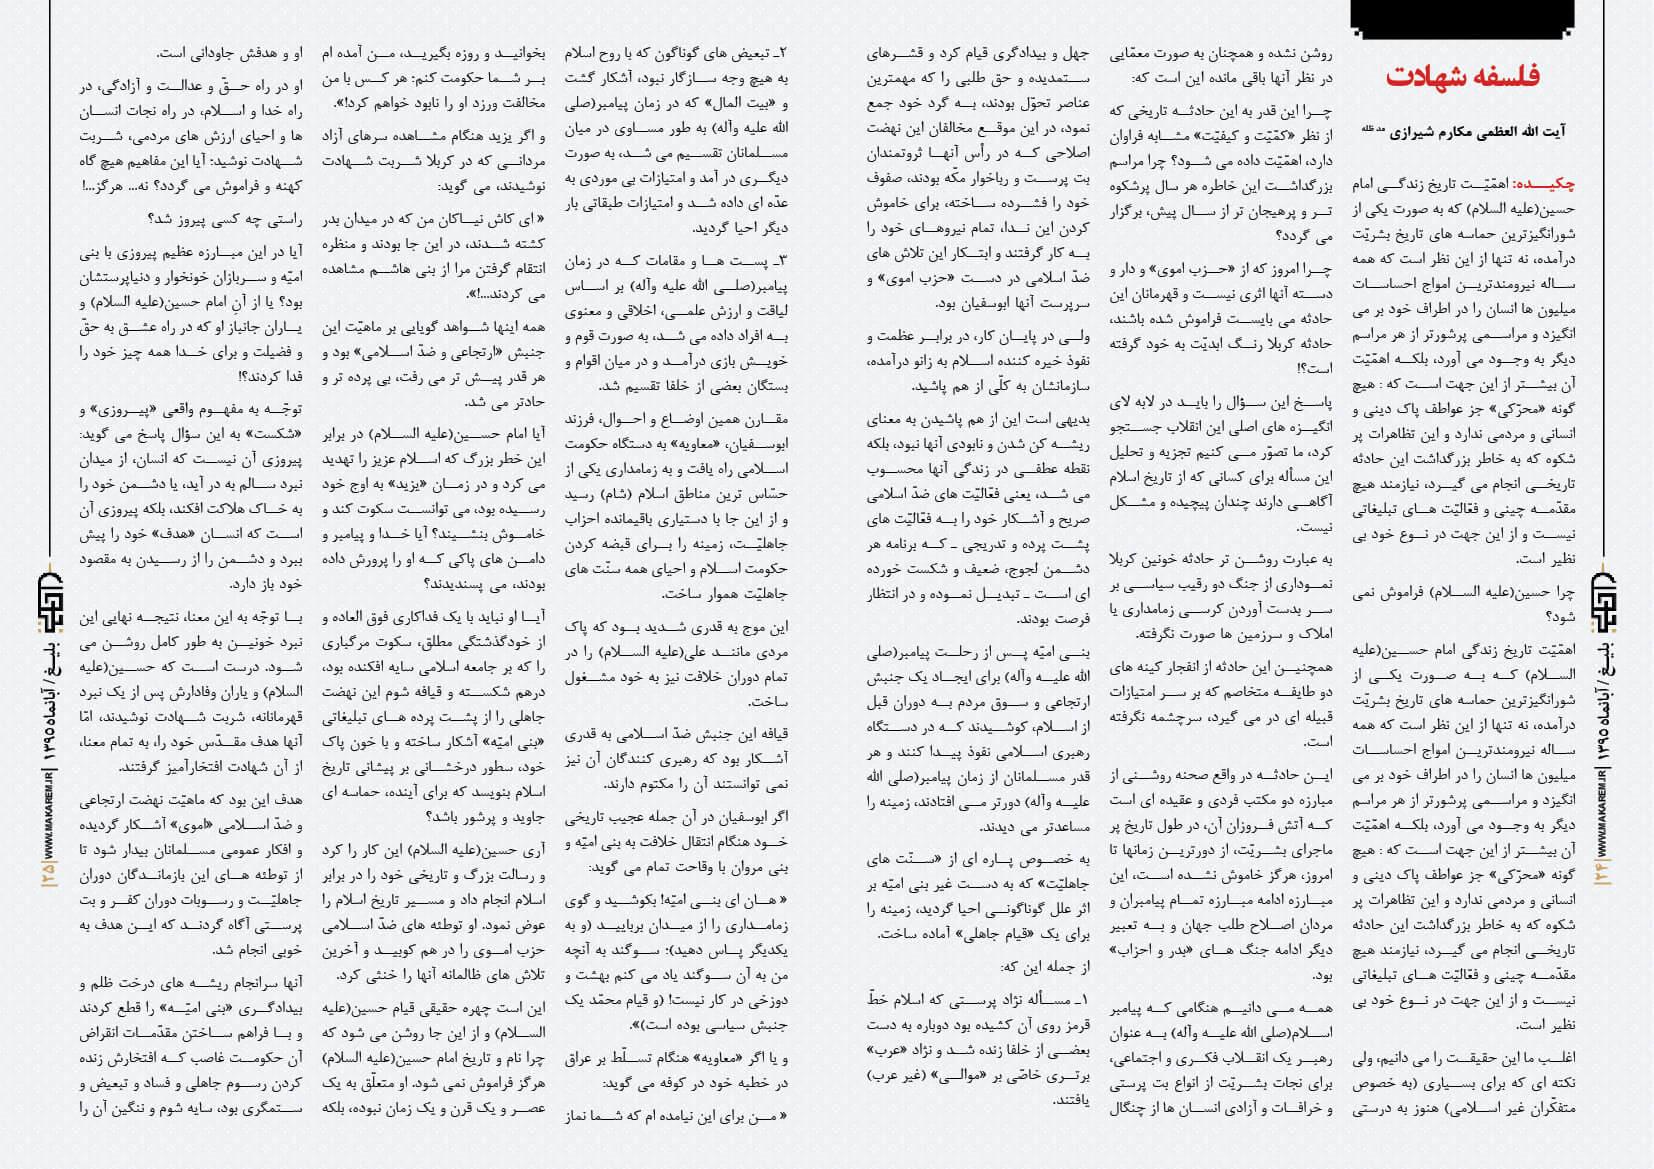 فلسفه شهادت-مدرسه الامام امیر المومنین (ع)